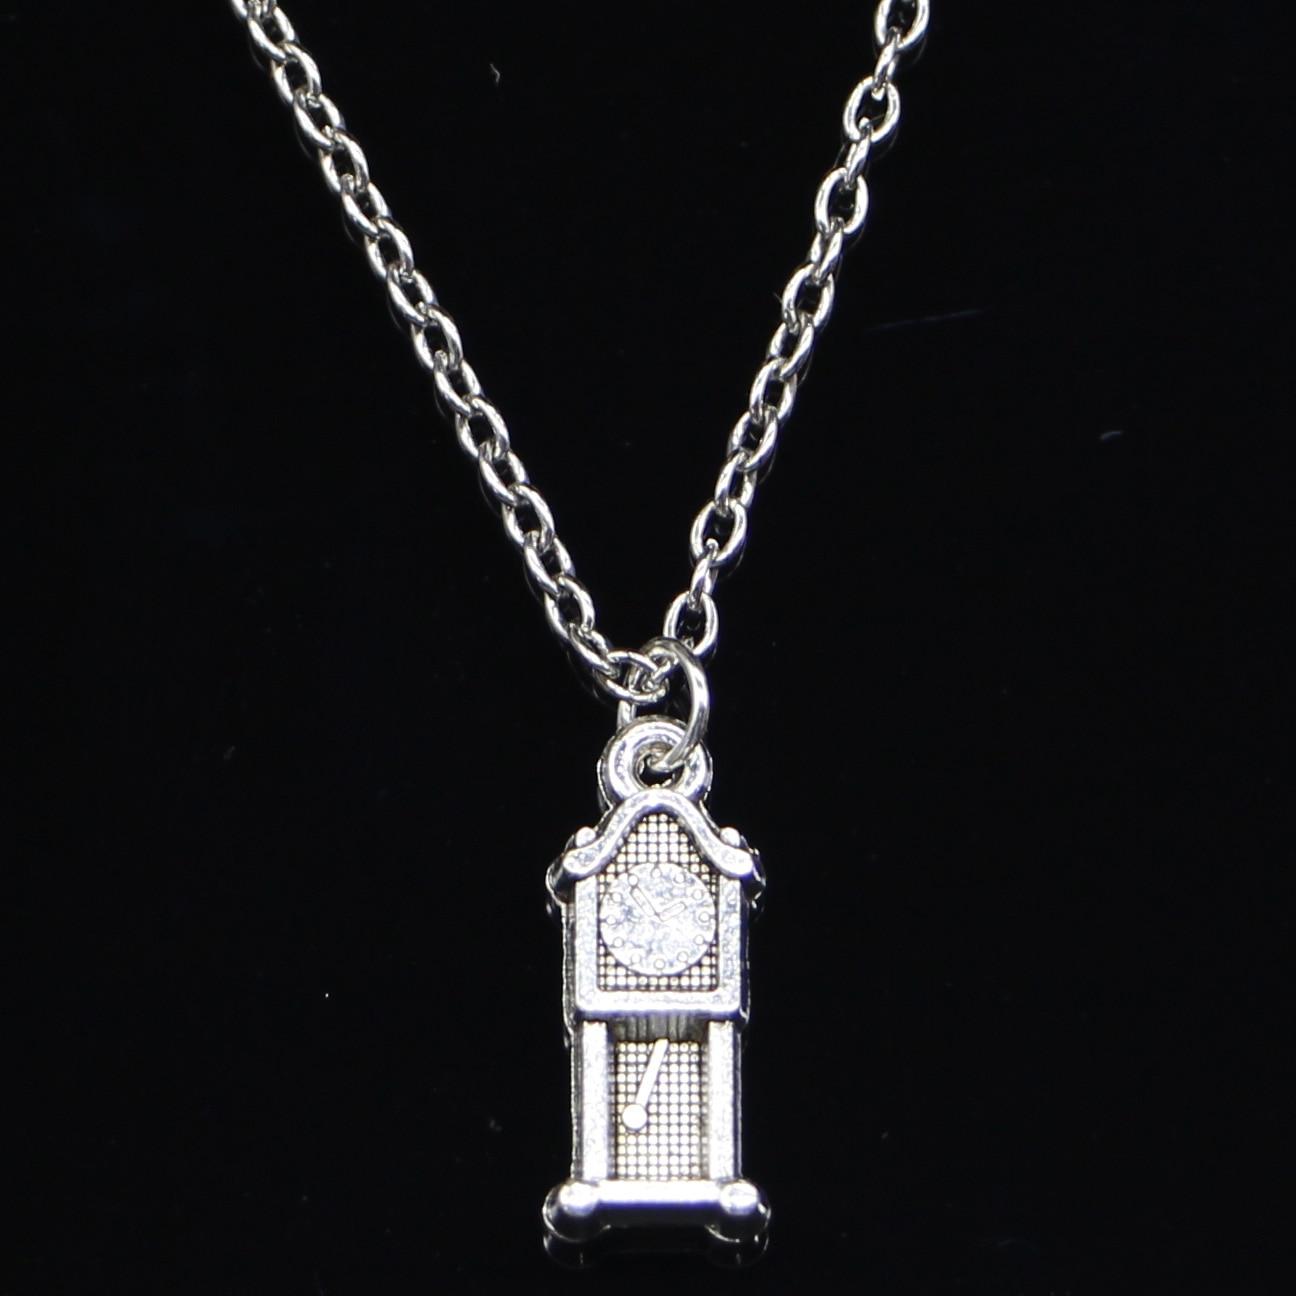 New Fashion Necklace 20x8mm grandfather clock antique Pendants Short Long Women Men Colar Gift Jewelry Choker